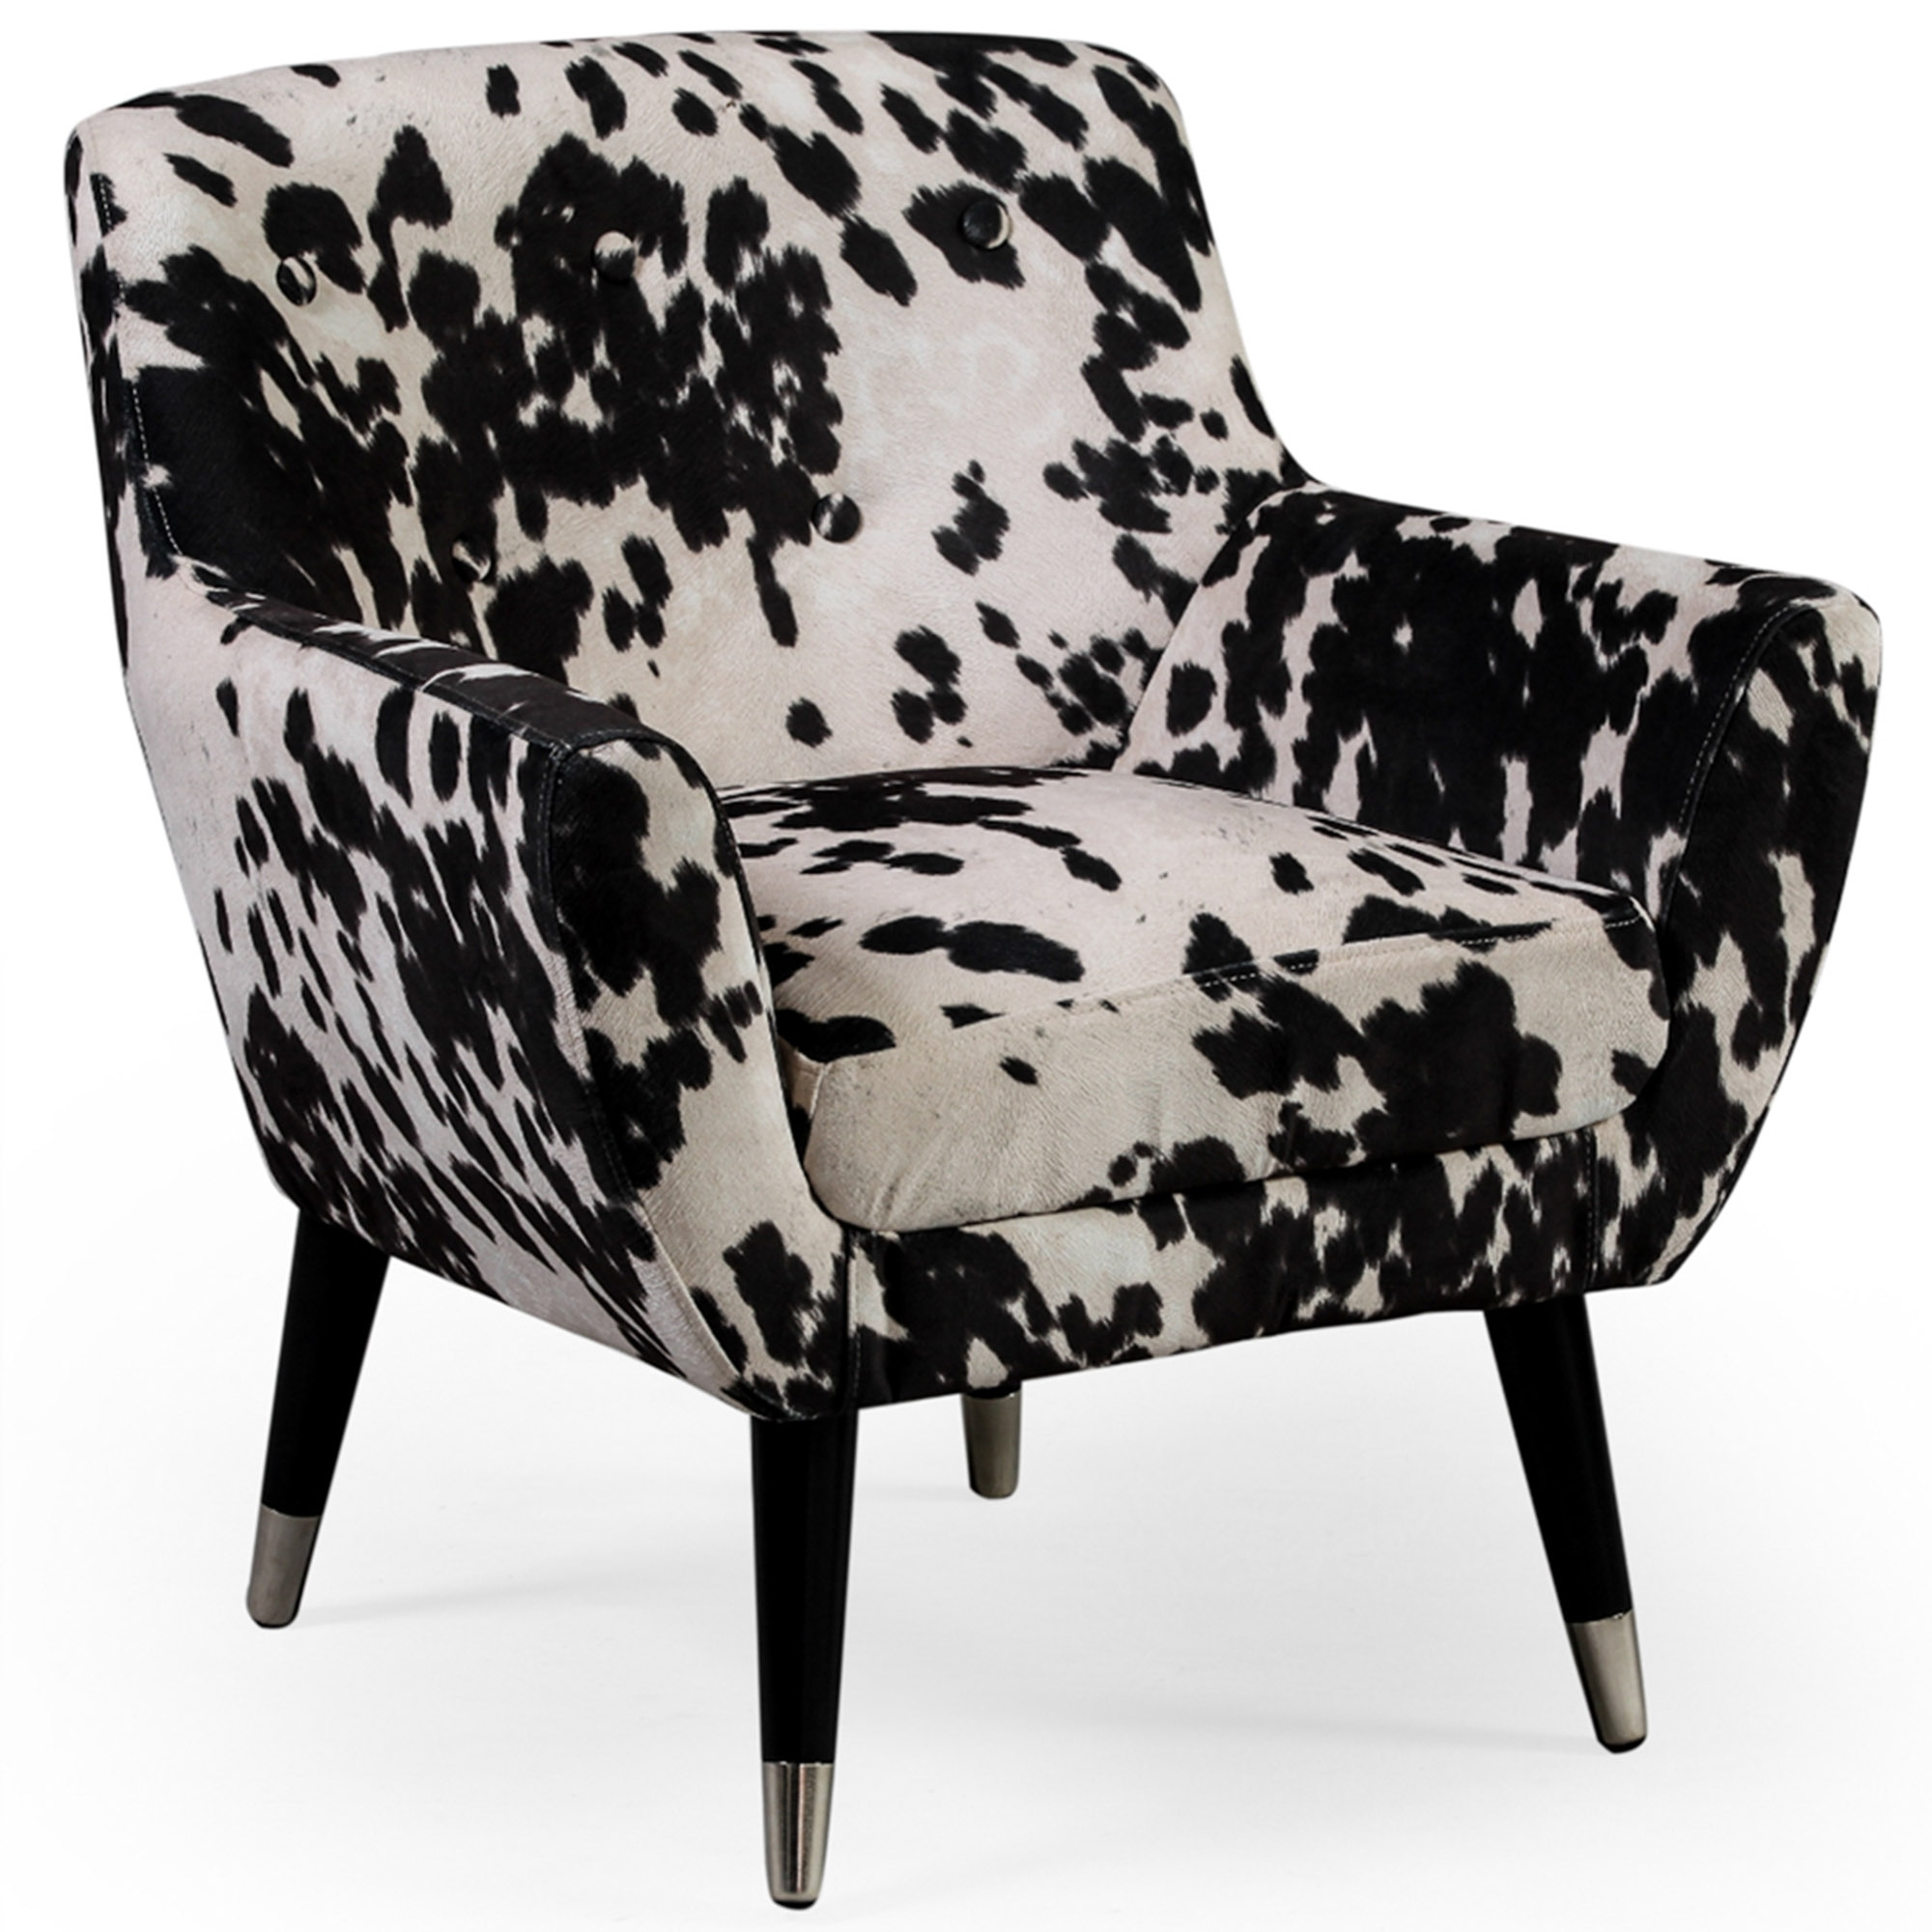 Black Cowhide Retro Armchair